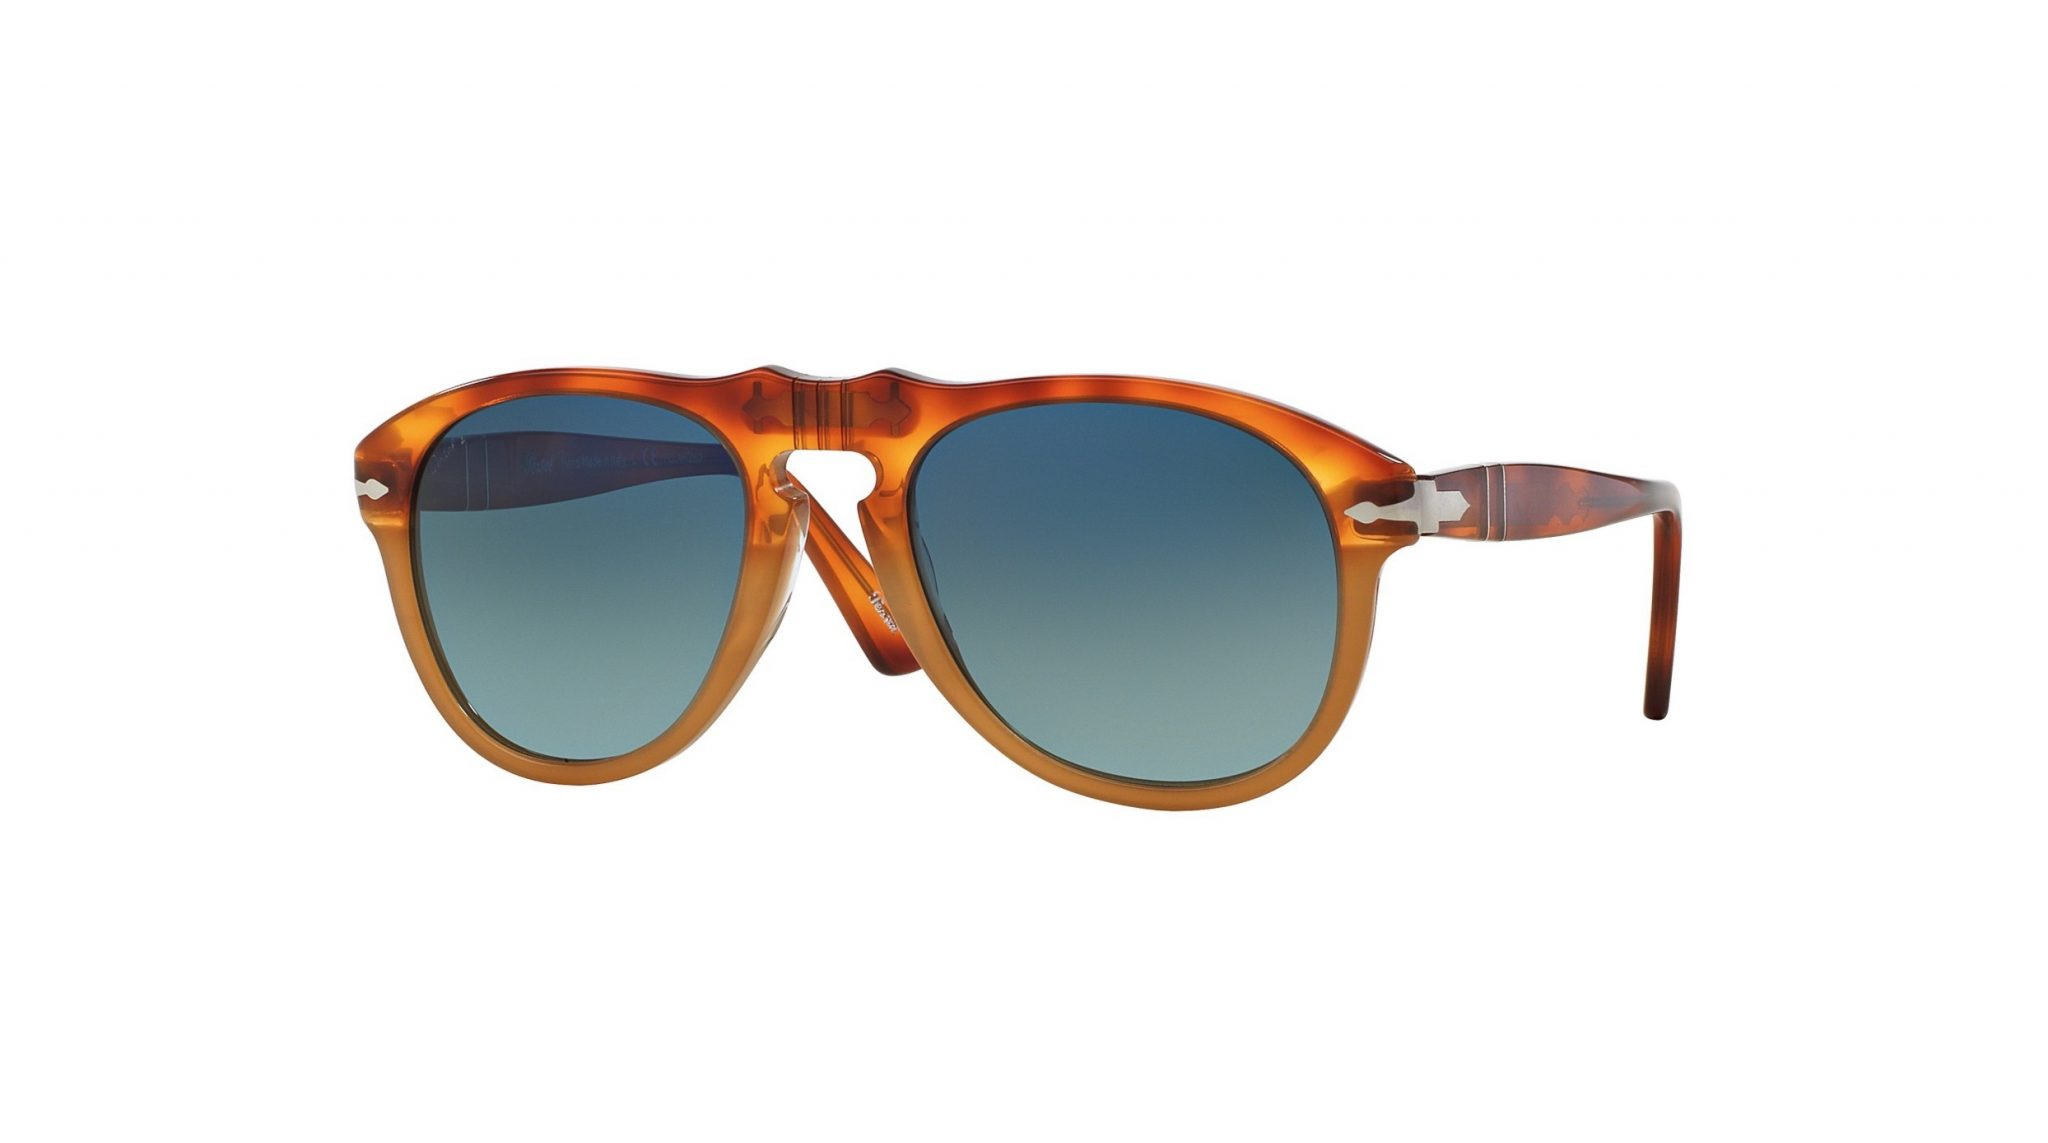 Persol 649 Series Sunglasses